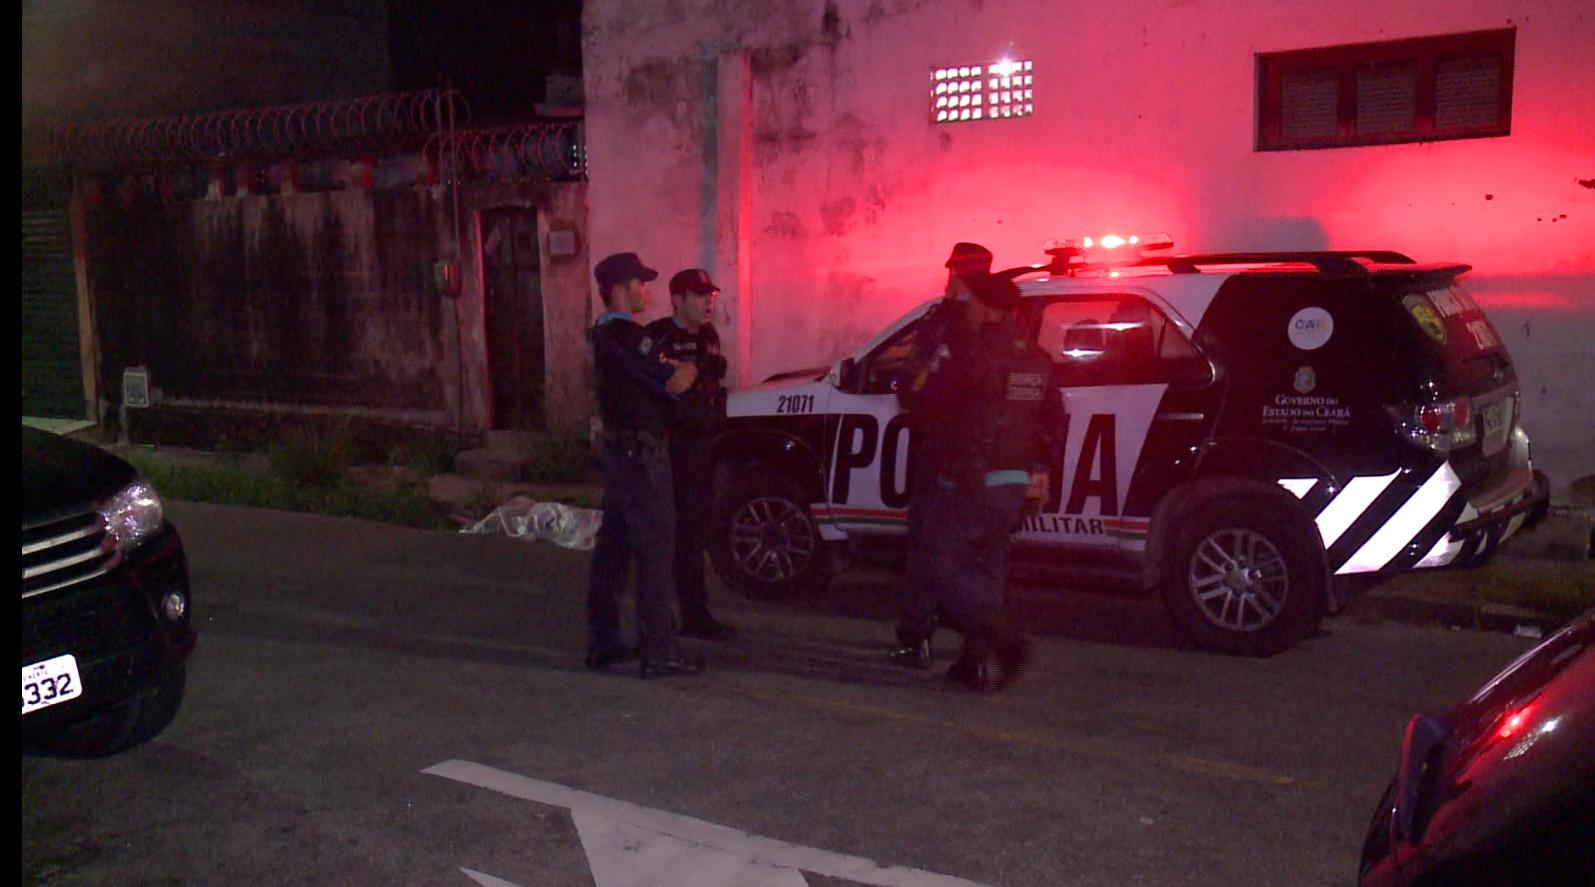 Integrantes de torcida organizada descrevem os momentos após a chacina no Benfica